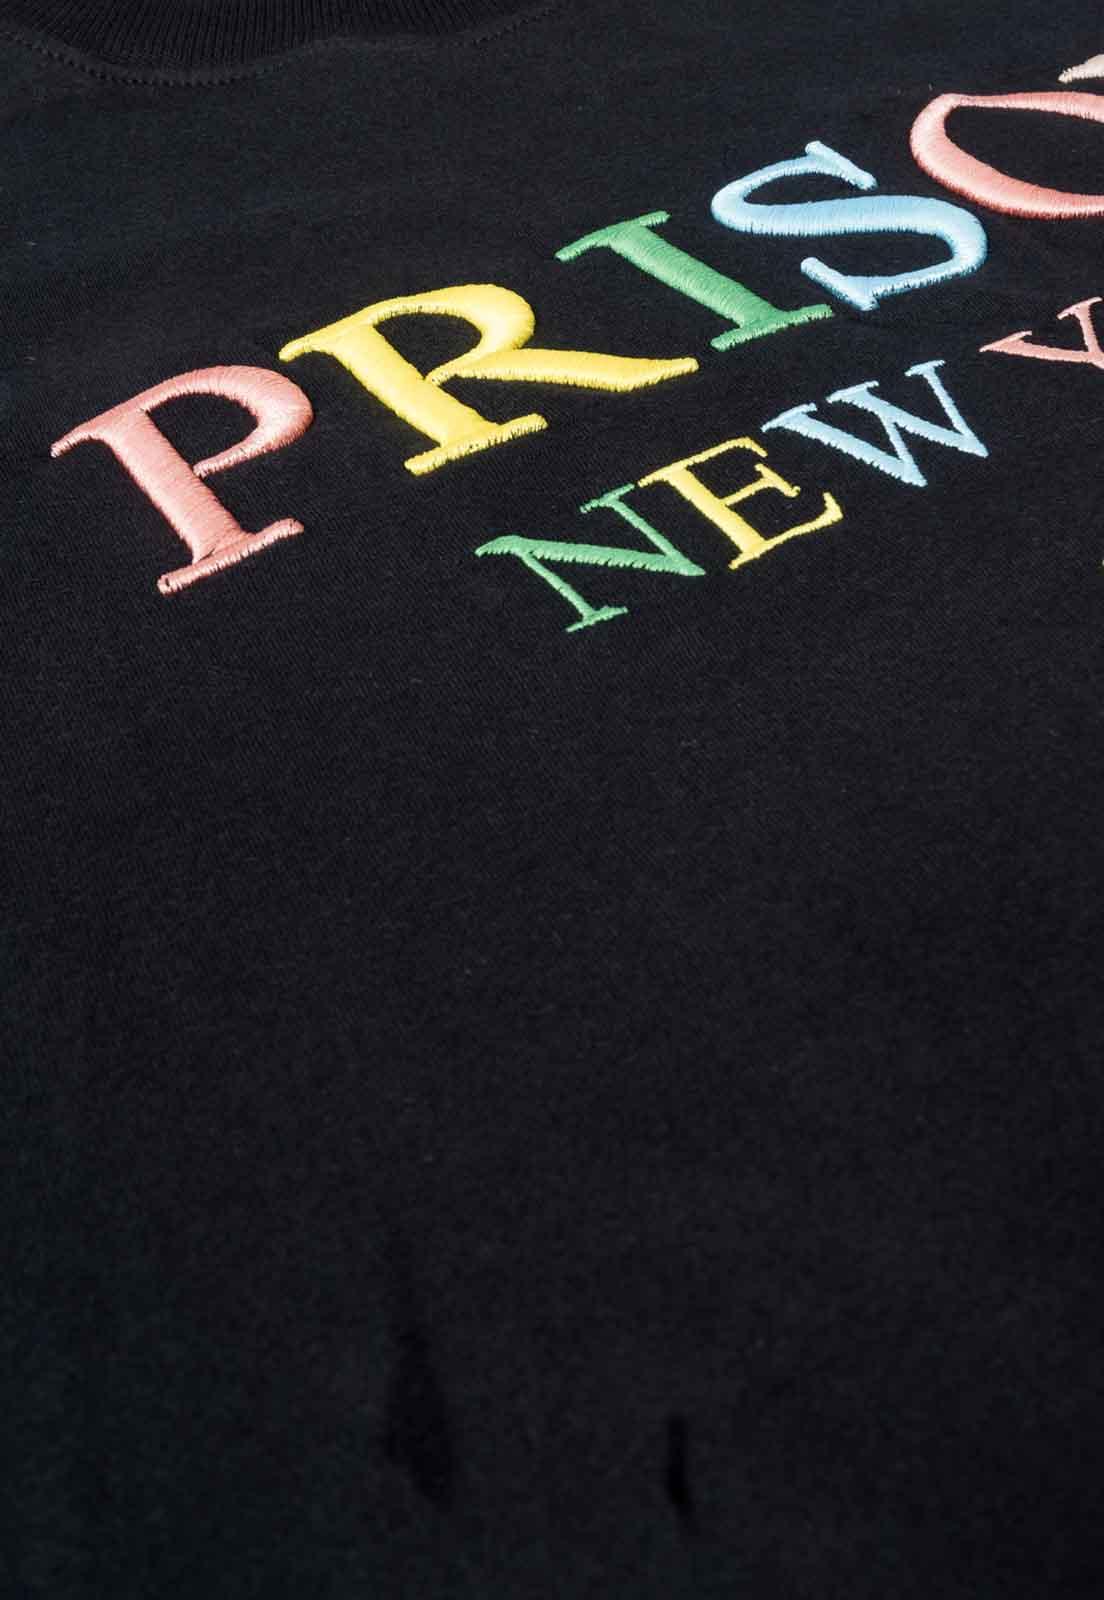 Camiseta Prison New York Needlework